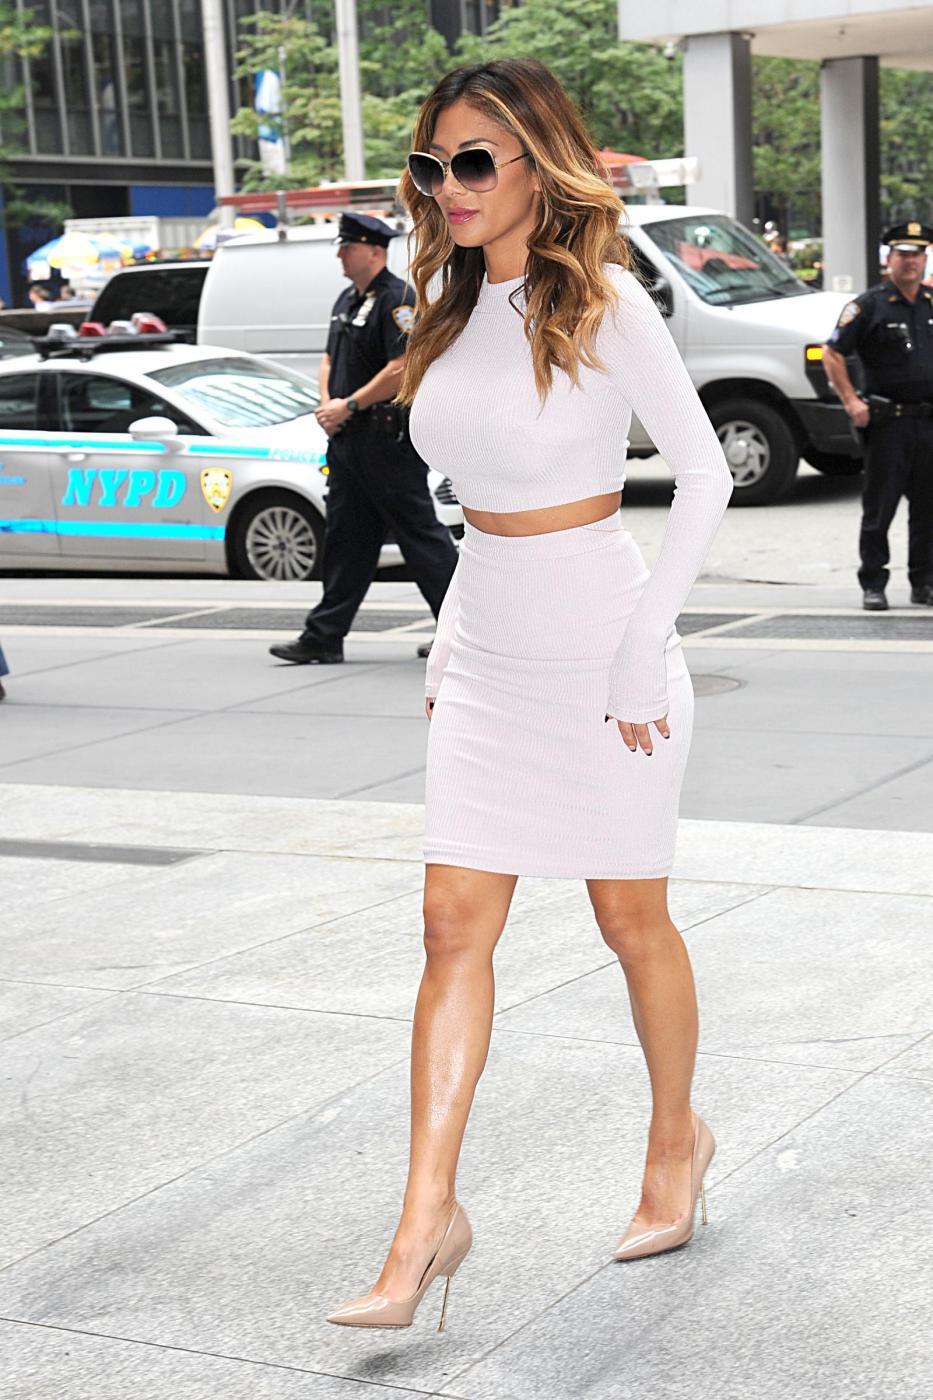 Nicole Scherzinger sempre più curvy e...bionda. Abiti super aderenti a New York FOTO 1